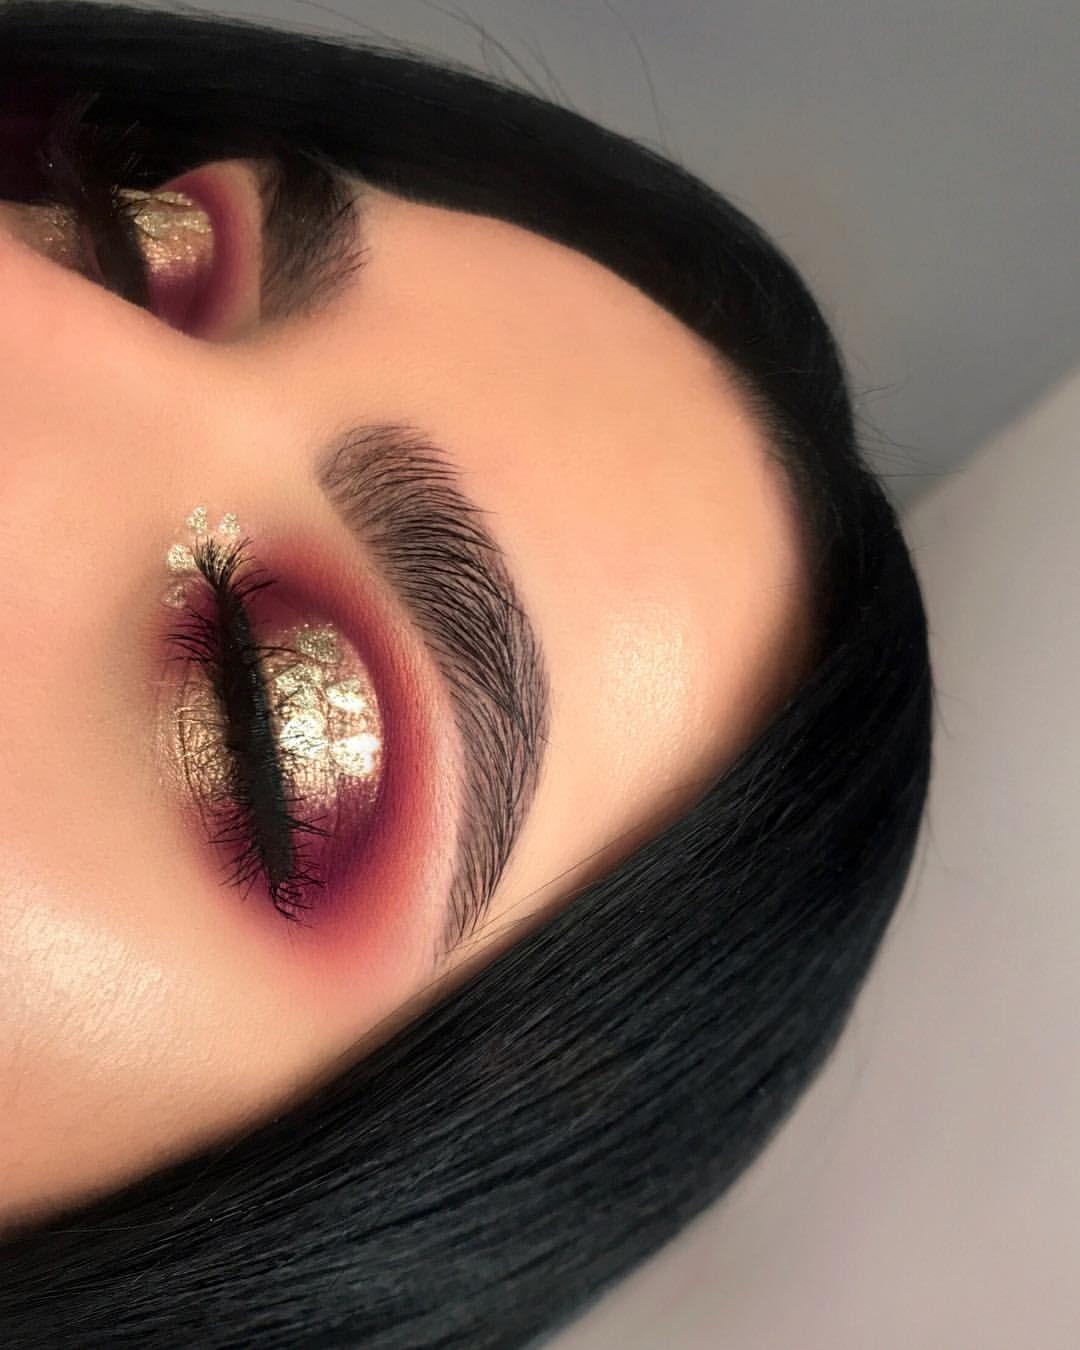 Mac cosmetics i like 2 watch gold eyeshadow #ad #makeup #beauty #macpinterest: ❤Darlings things❤ more inspiration looks